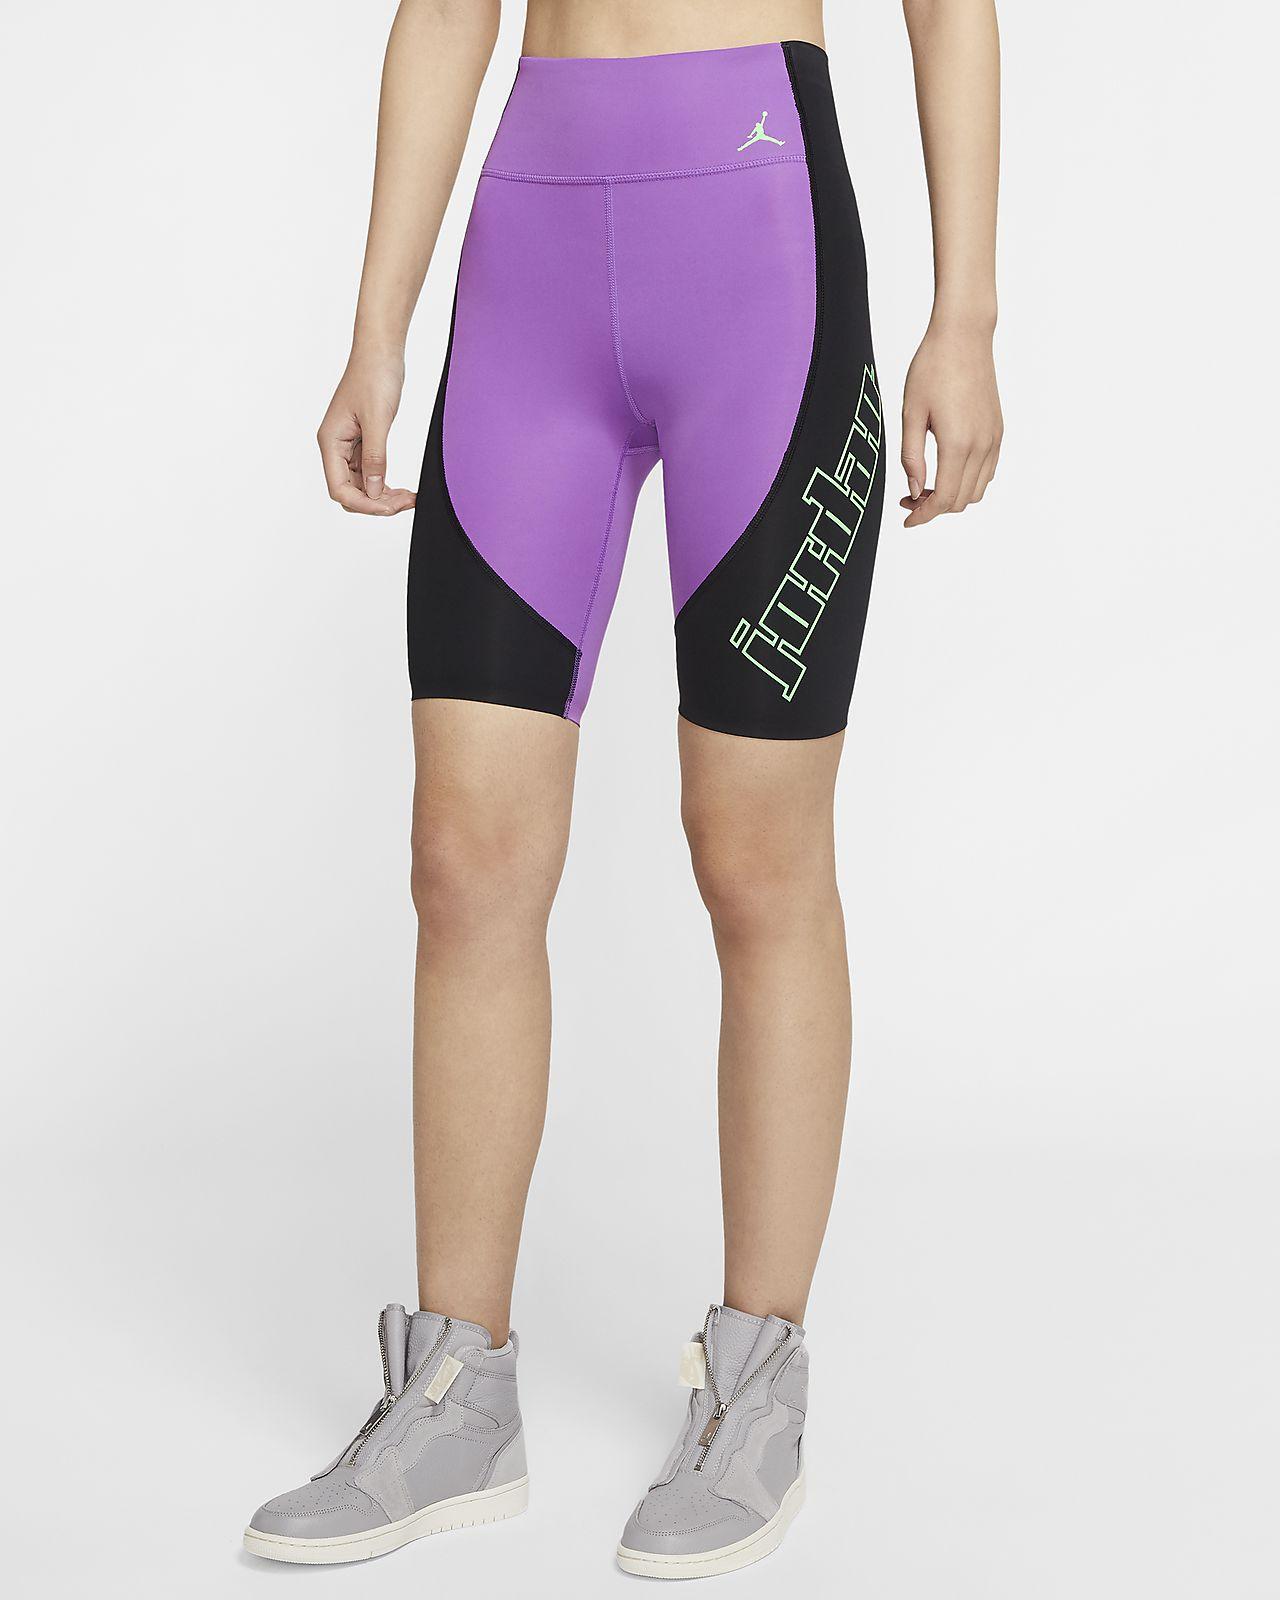 Jordan Moto Women's Bike Shorts